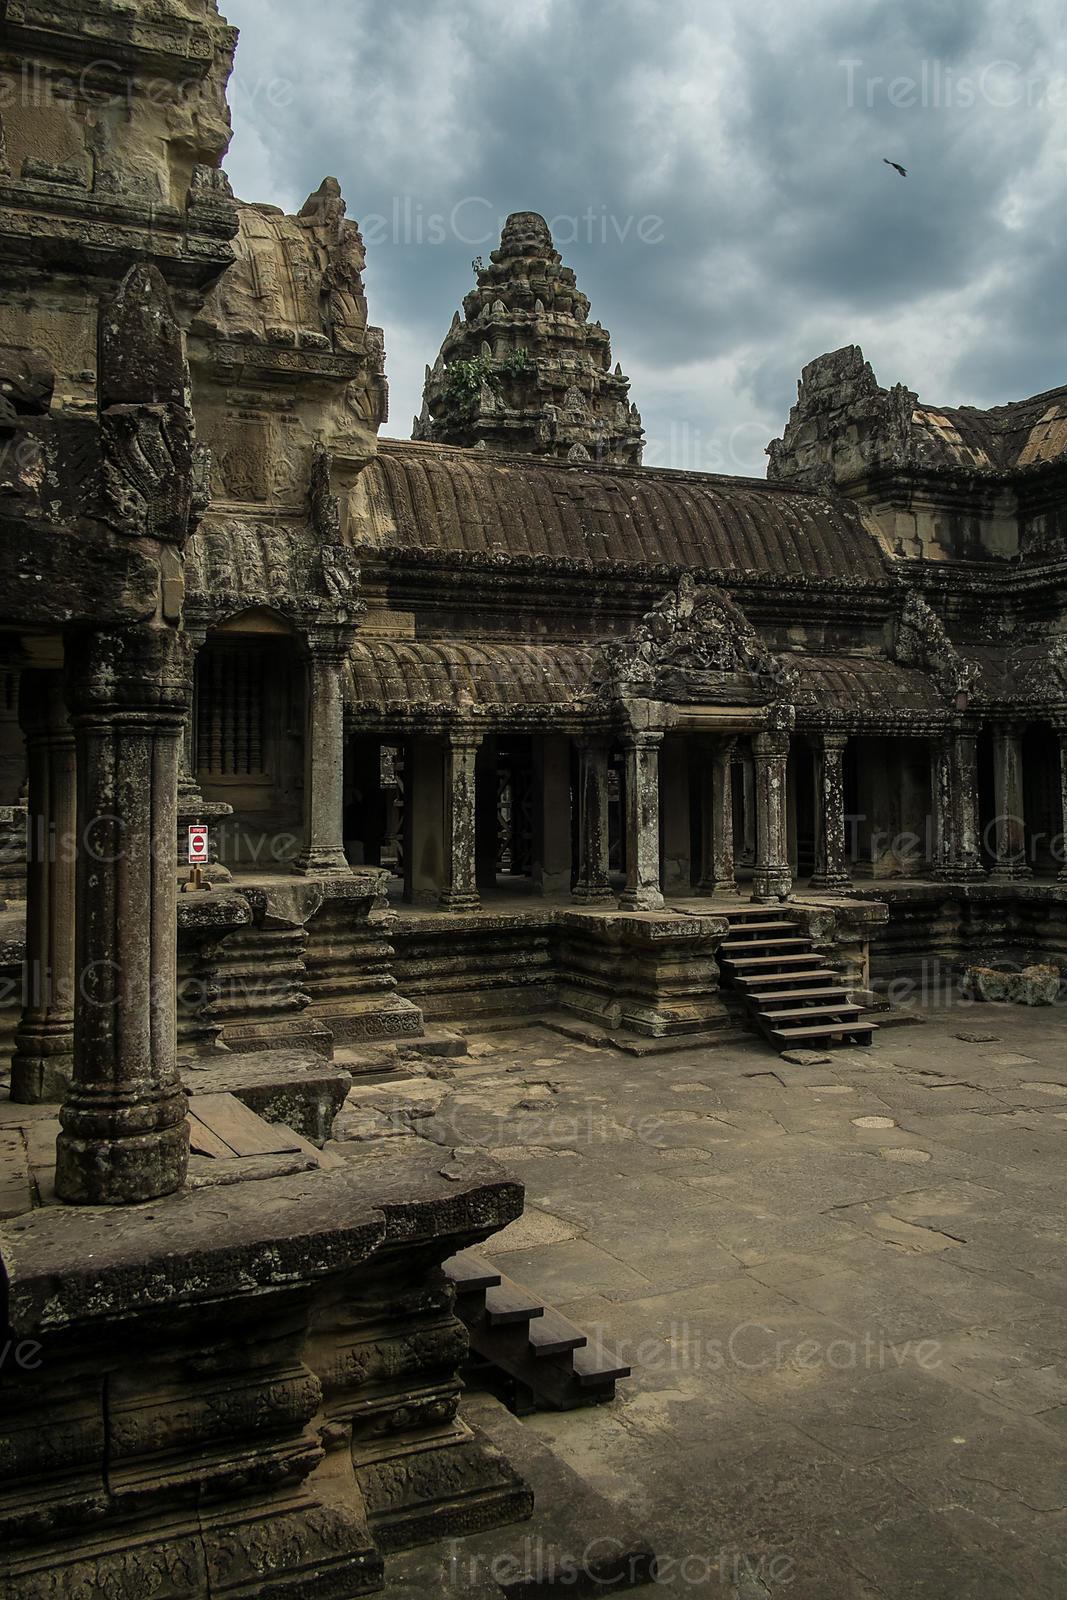 Image  Old Temple At Angkor Wat  Cambodia Under Dramatic